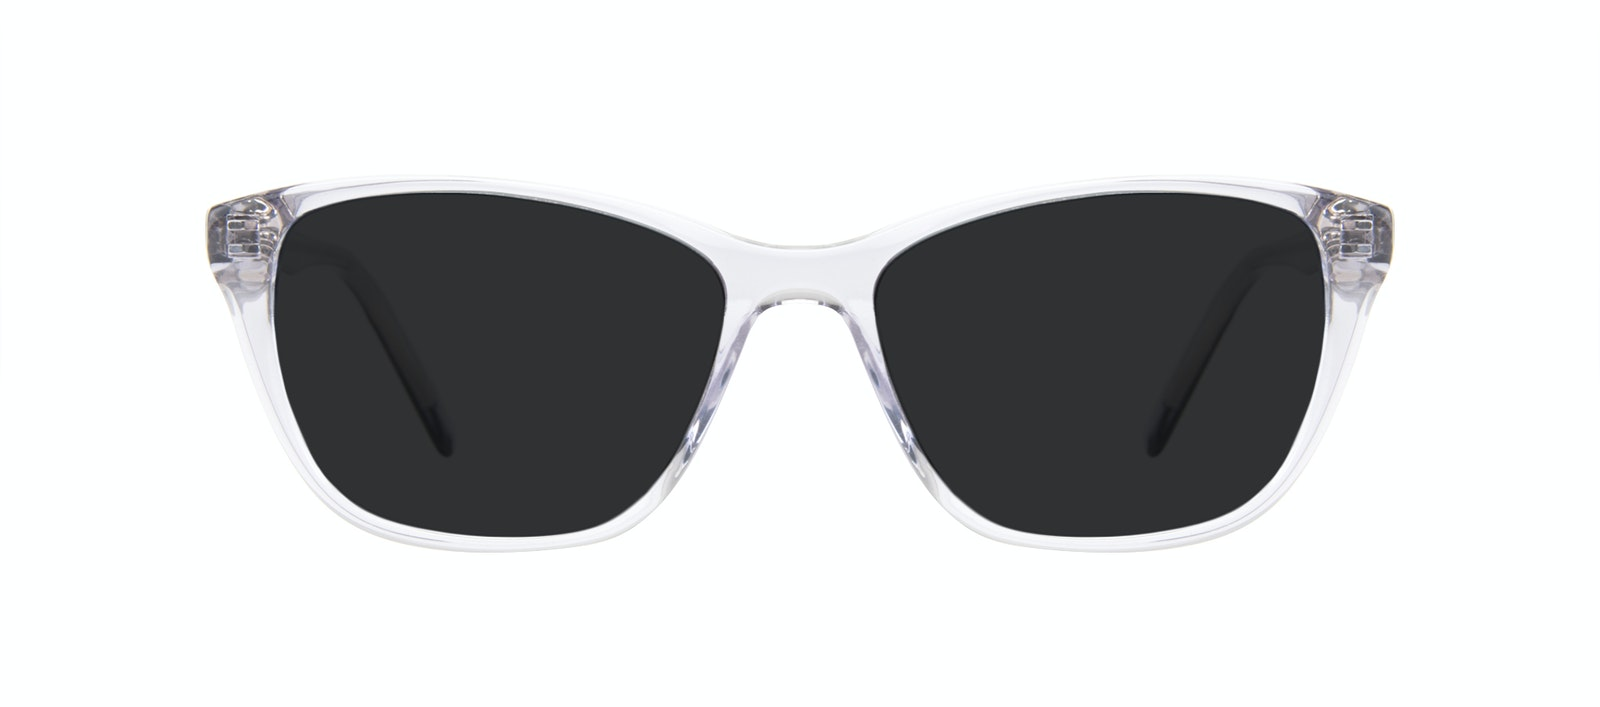 Affordable Fashion Glasses Cat Eye Sunglasses Women Myrtle Petite Cloud Front